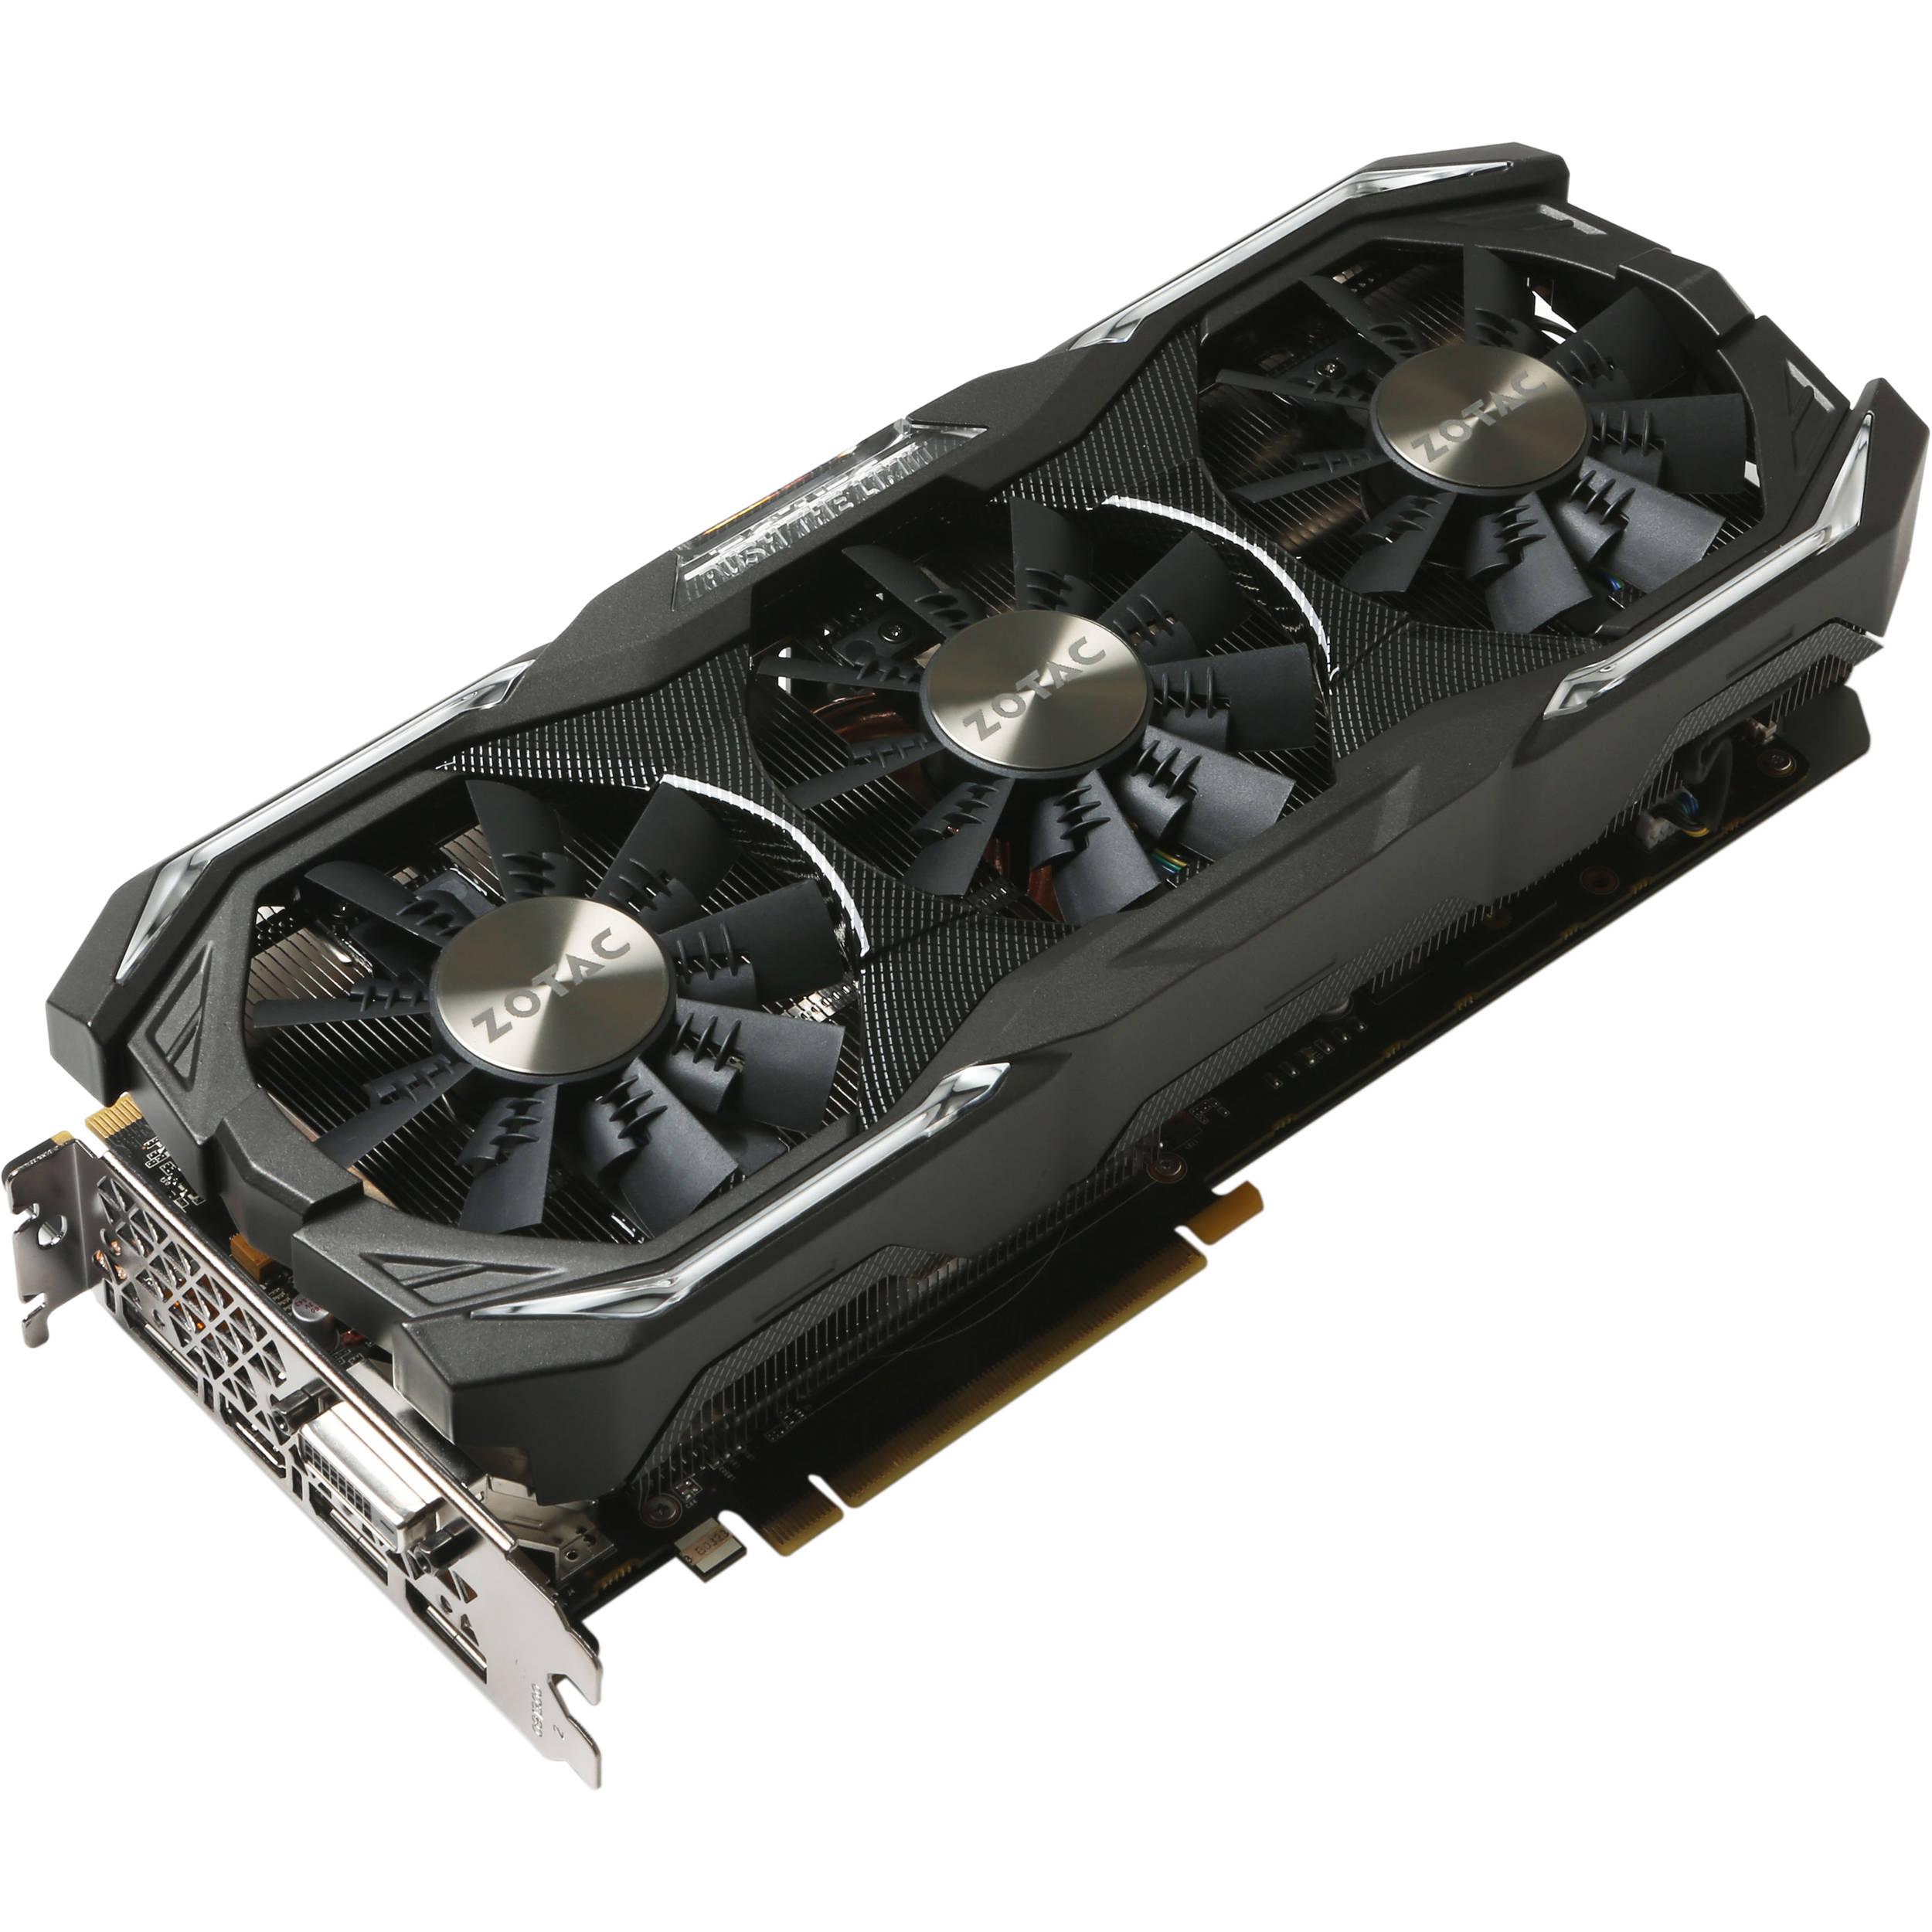 ZOTAC GeForce GTX 1070 Ti AMP! Extreme Graphics Card